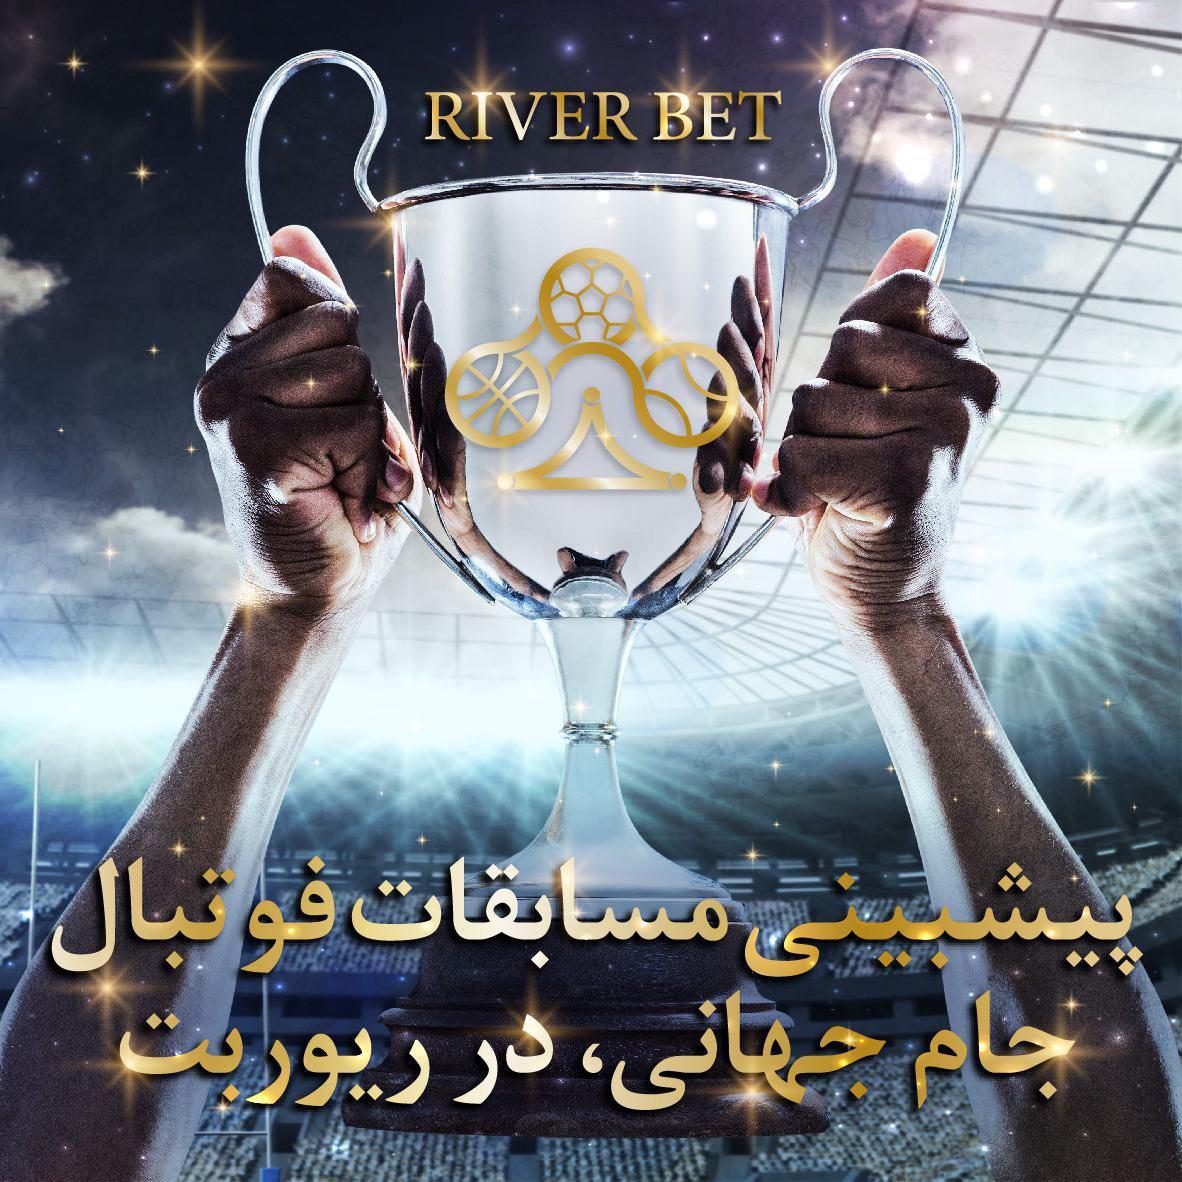 سایت پیش بینی فوتبال ایرانی riverbet